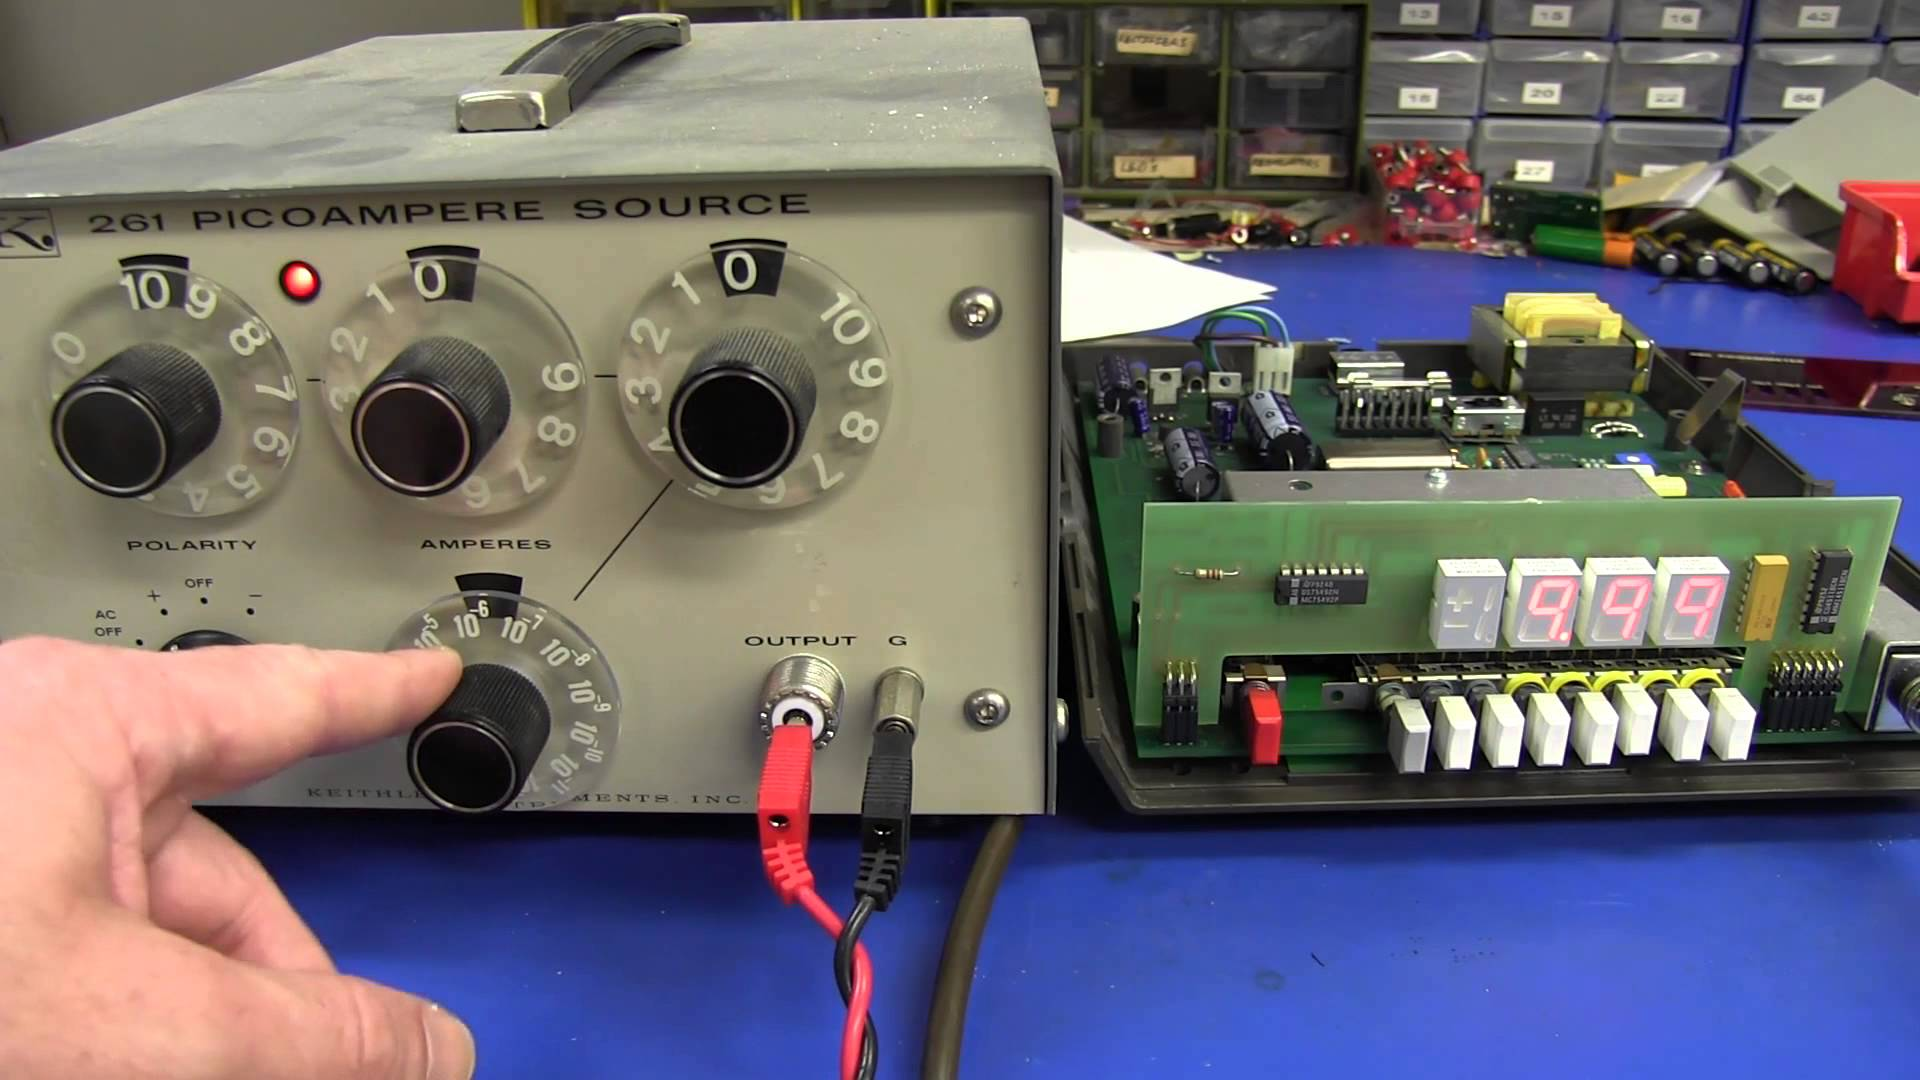 EEVblog #406 – Keithley 480 Picoammeter Teardown & Calibration